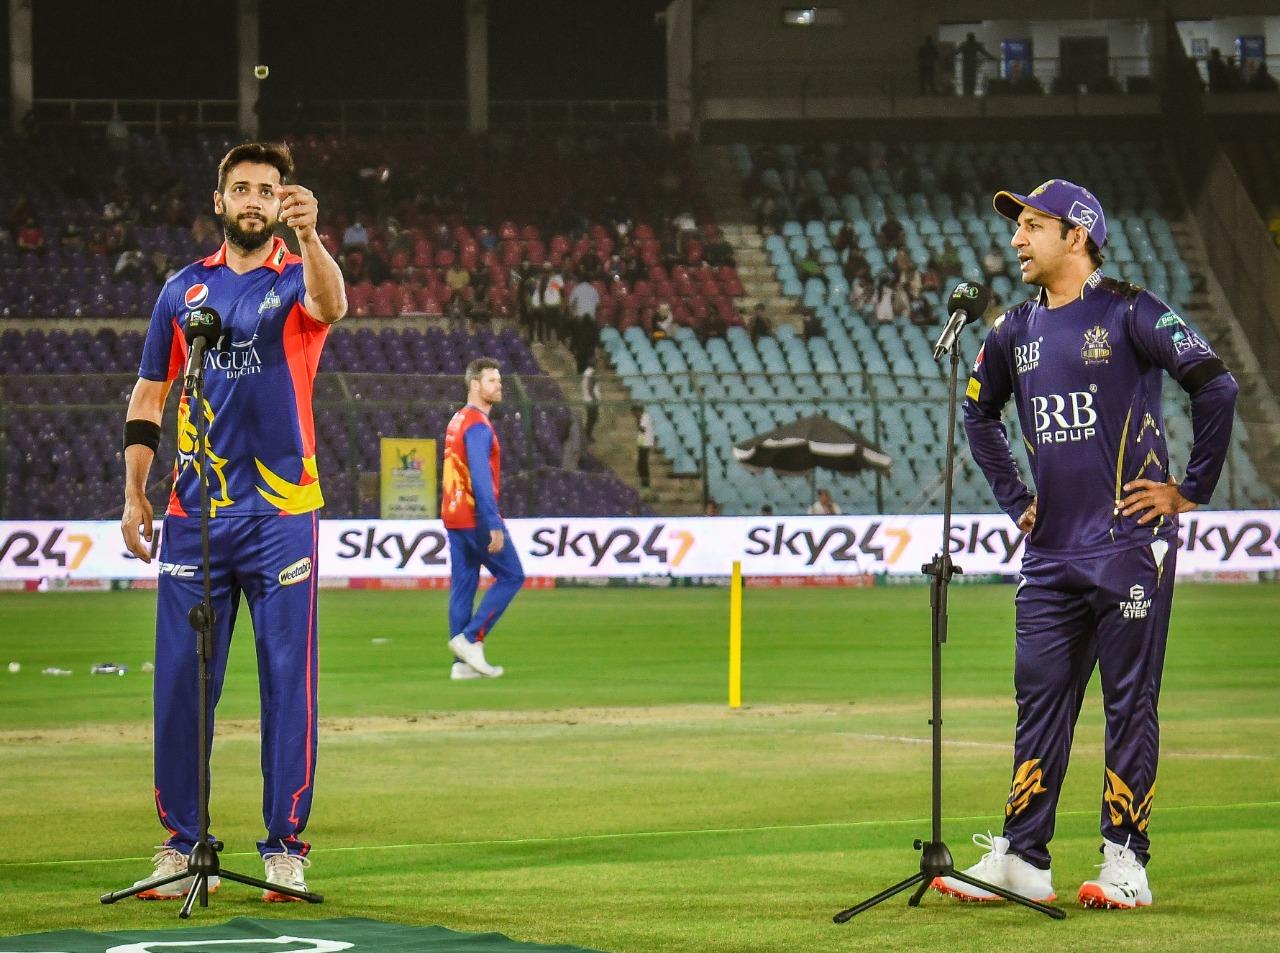 Karachi Kings vs Quetta Gladiators Match Preview, Details, Prediction